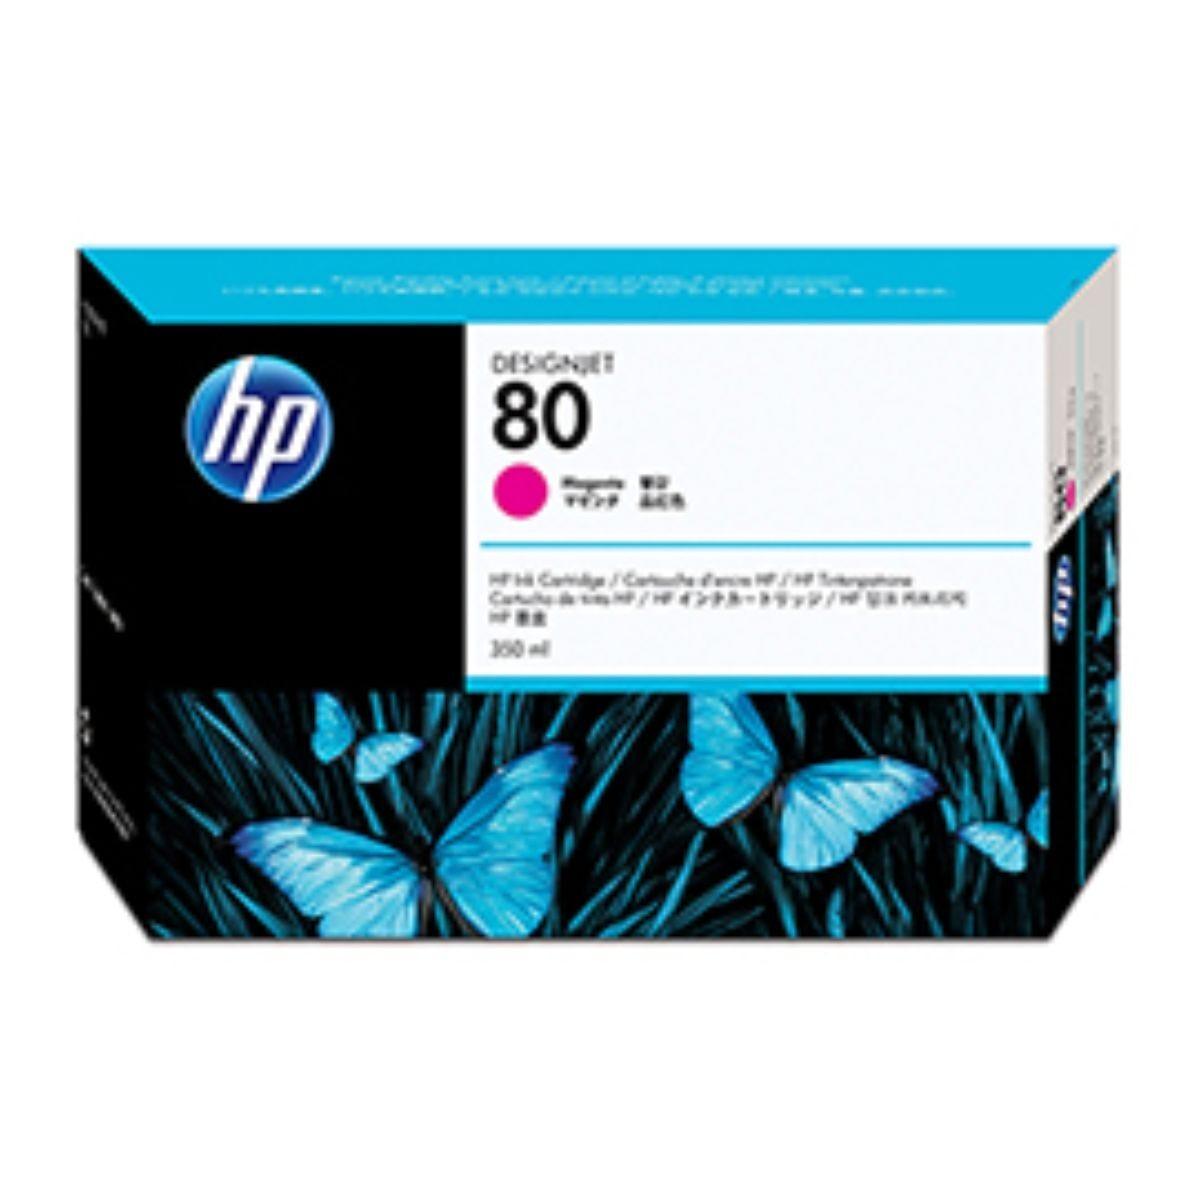 HP 80 Ink Cartridge Magenta